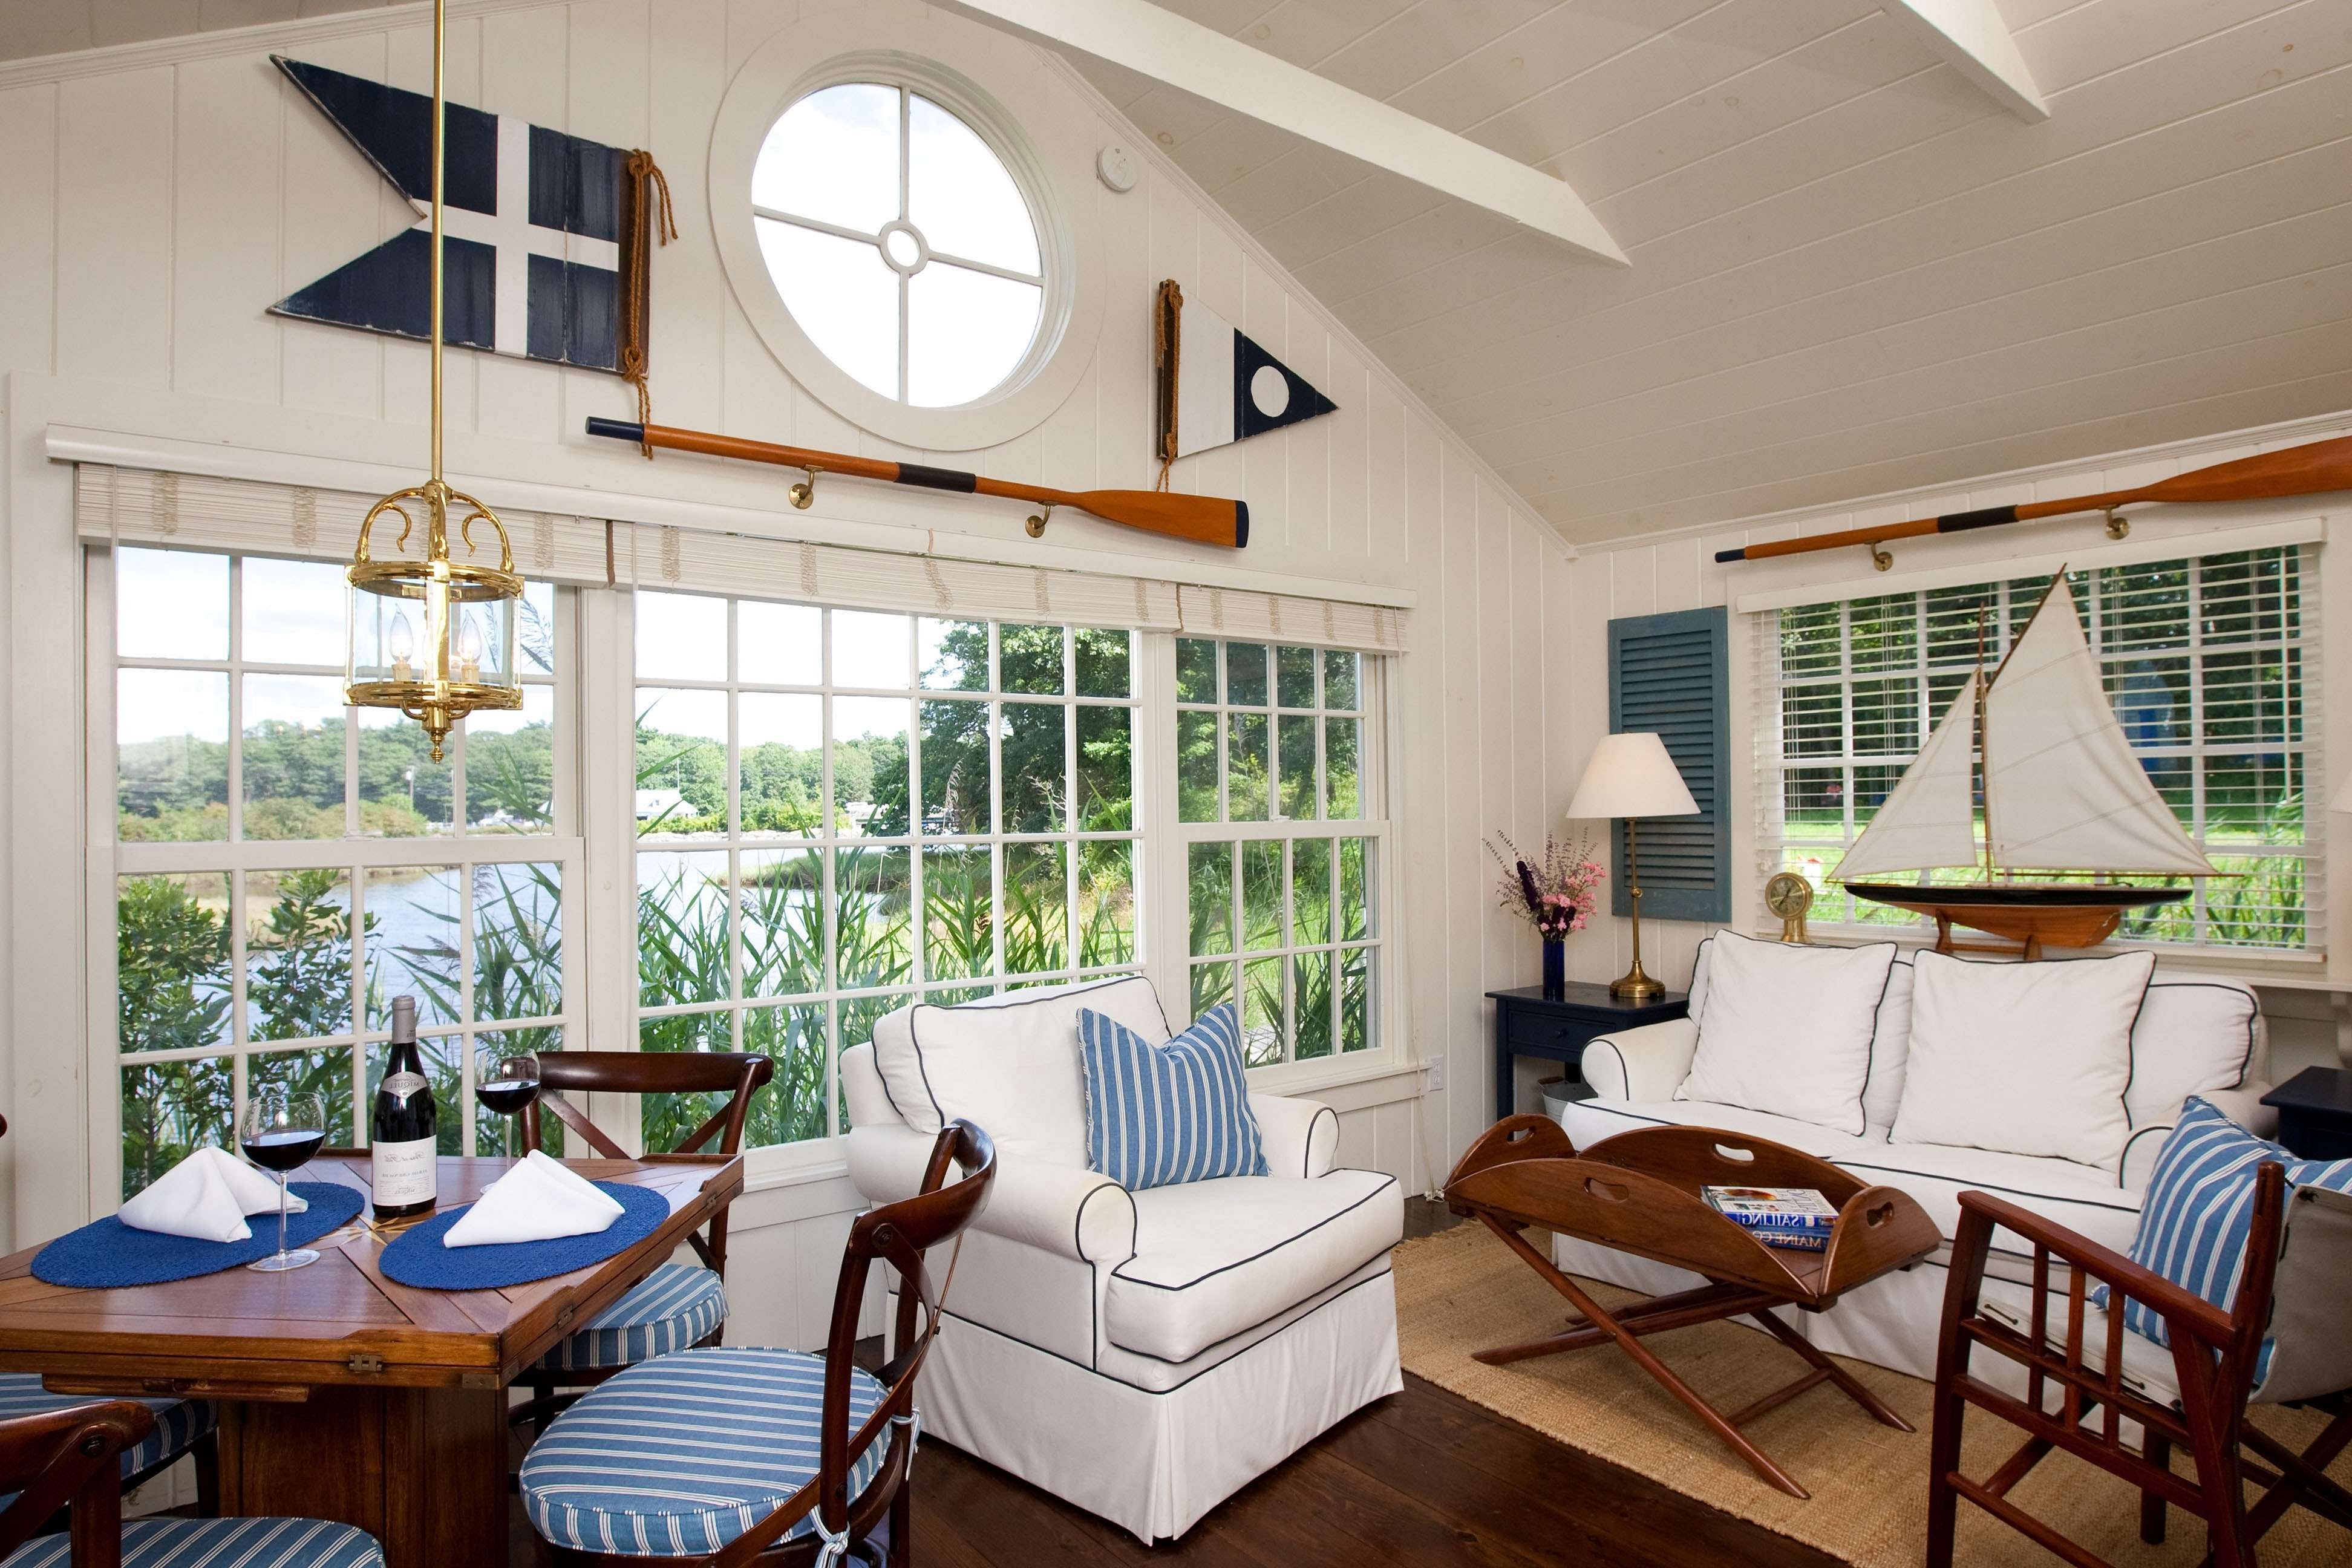 25 Marvelous Lake House Decorating Ideas You Should Try Lake